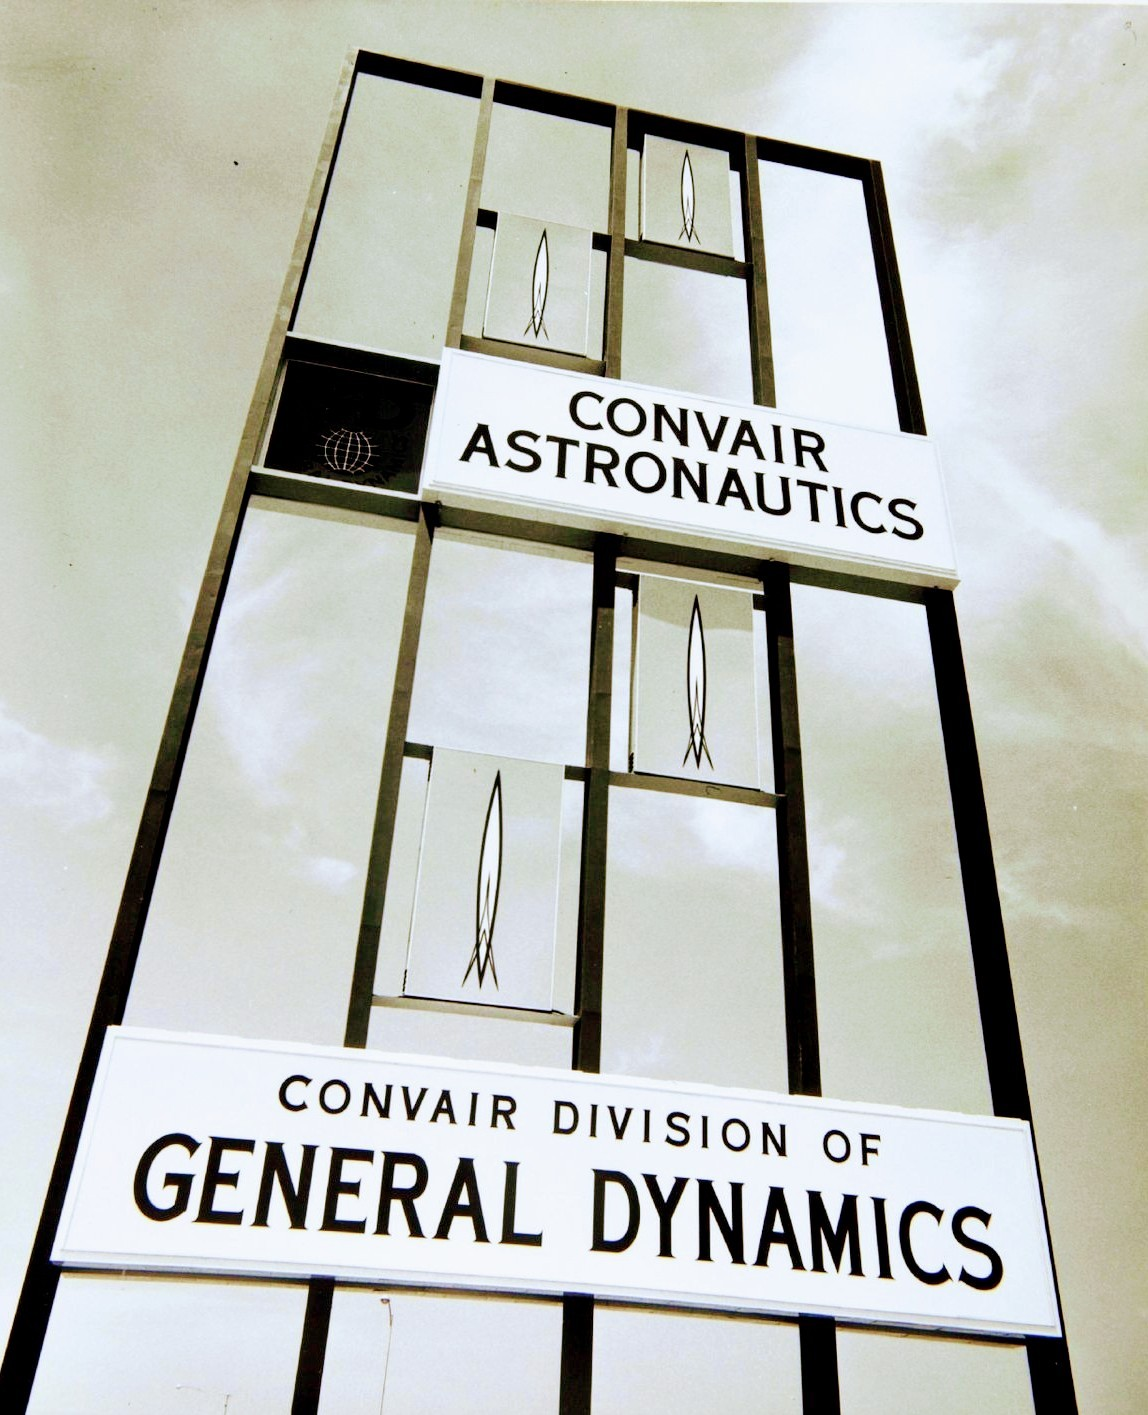 Convair Astronautics/General Dynamics Kearny Mesa Plant entrance sign - San Diego, California U.S.A. - 1958